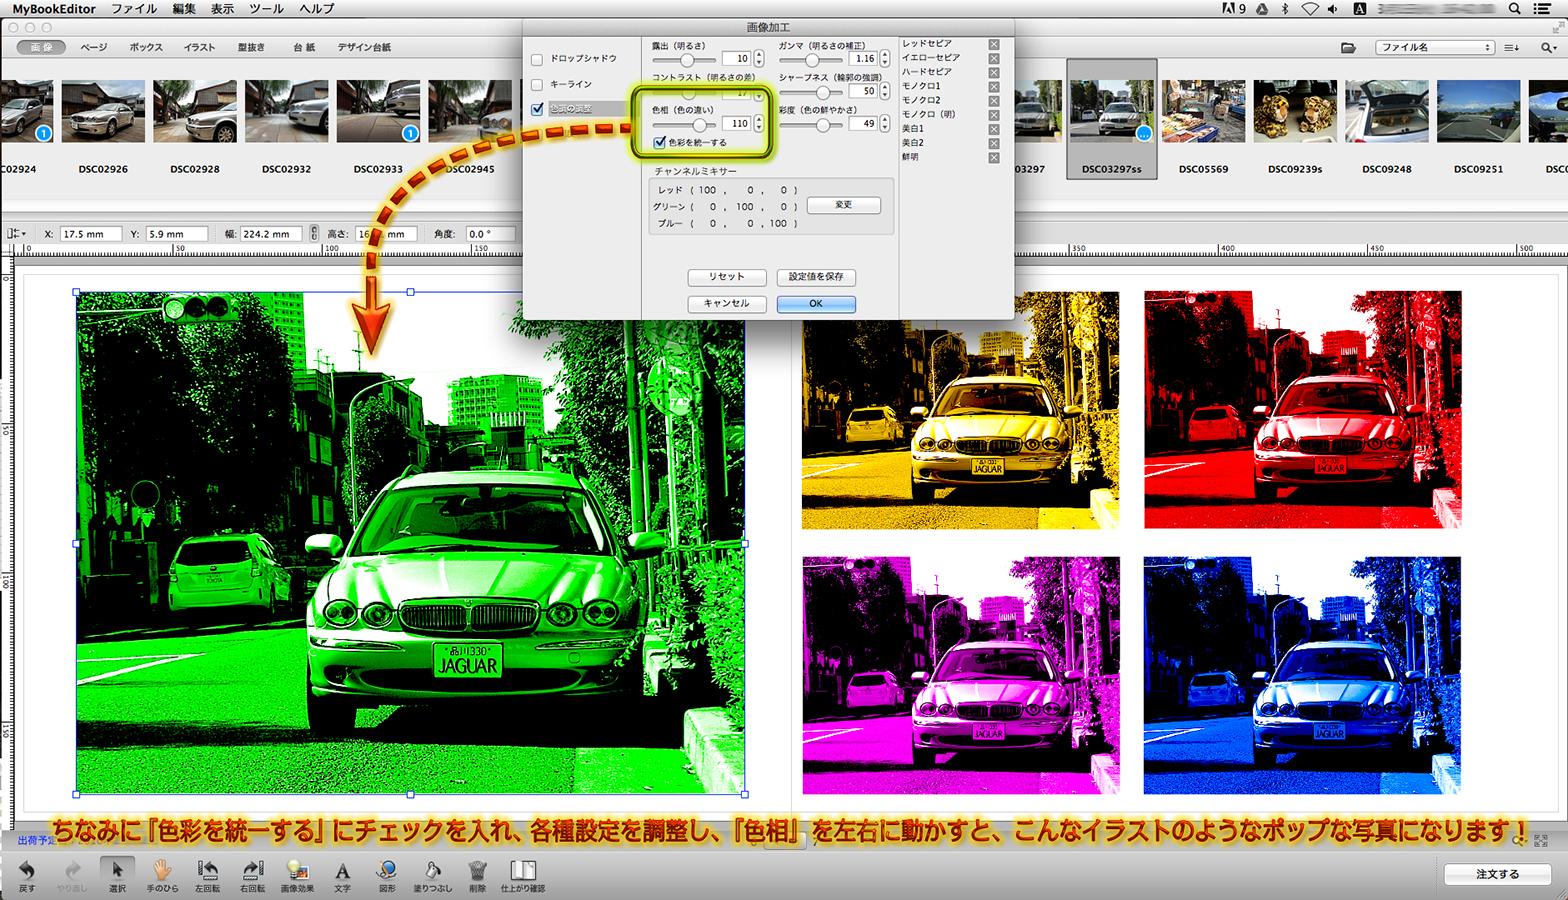 http://moritetsu.info/car/img/mb052-2016-03-01-16-42-00.jpg